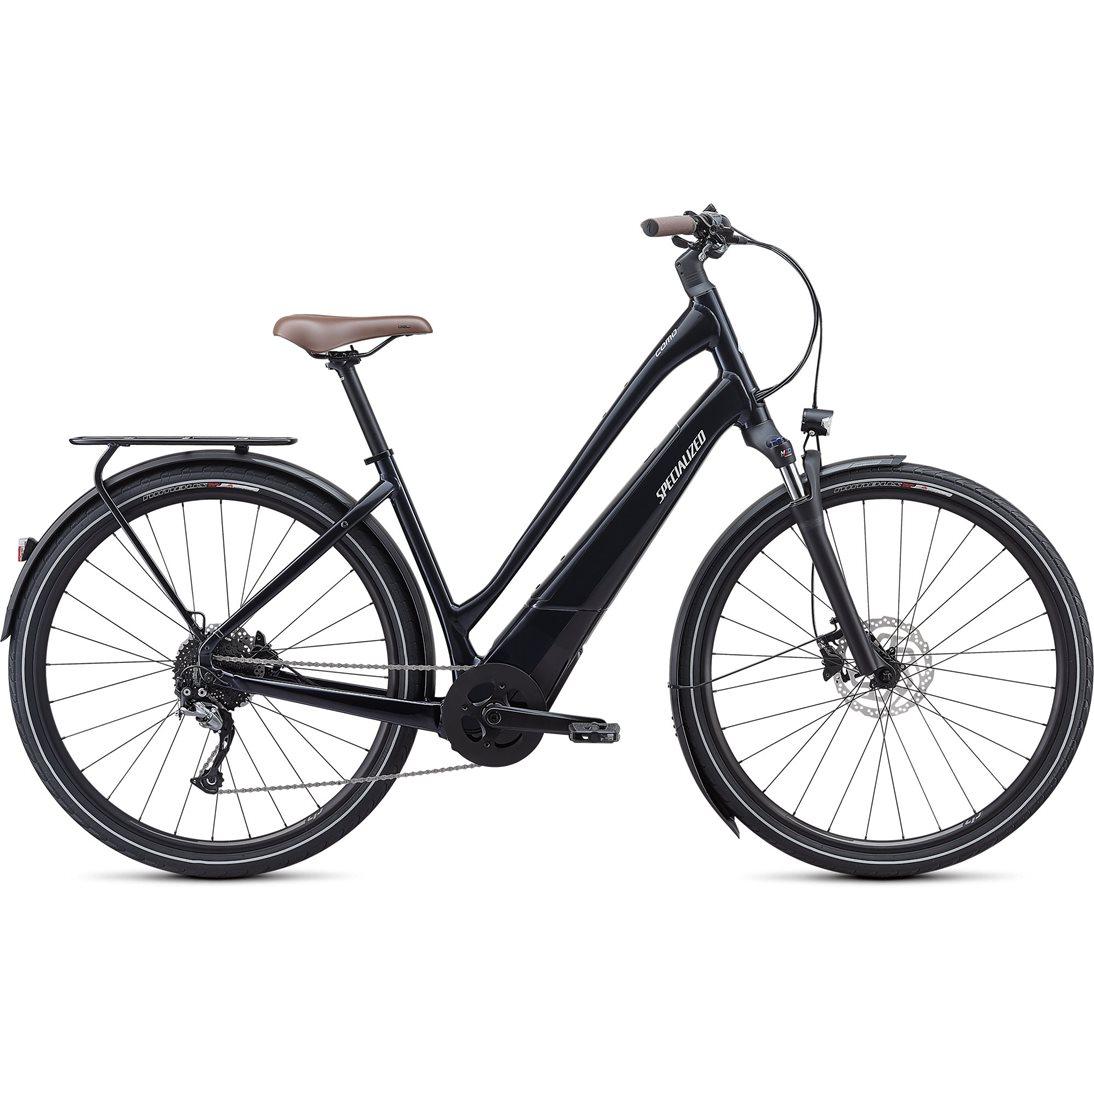 Specialized Turbo Como 3.0 2021 Step Thru Electric Hybrid Bike